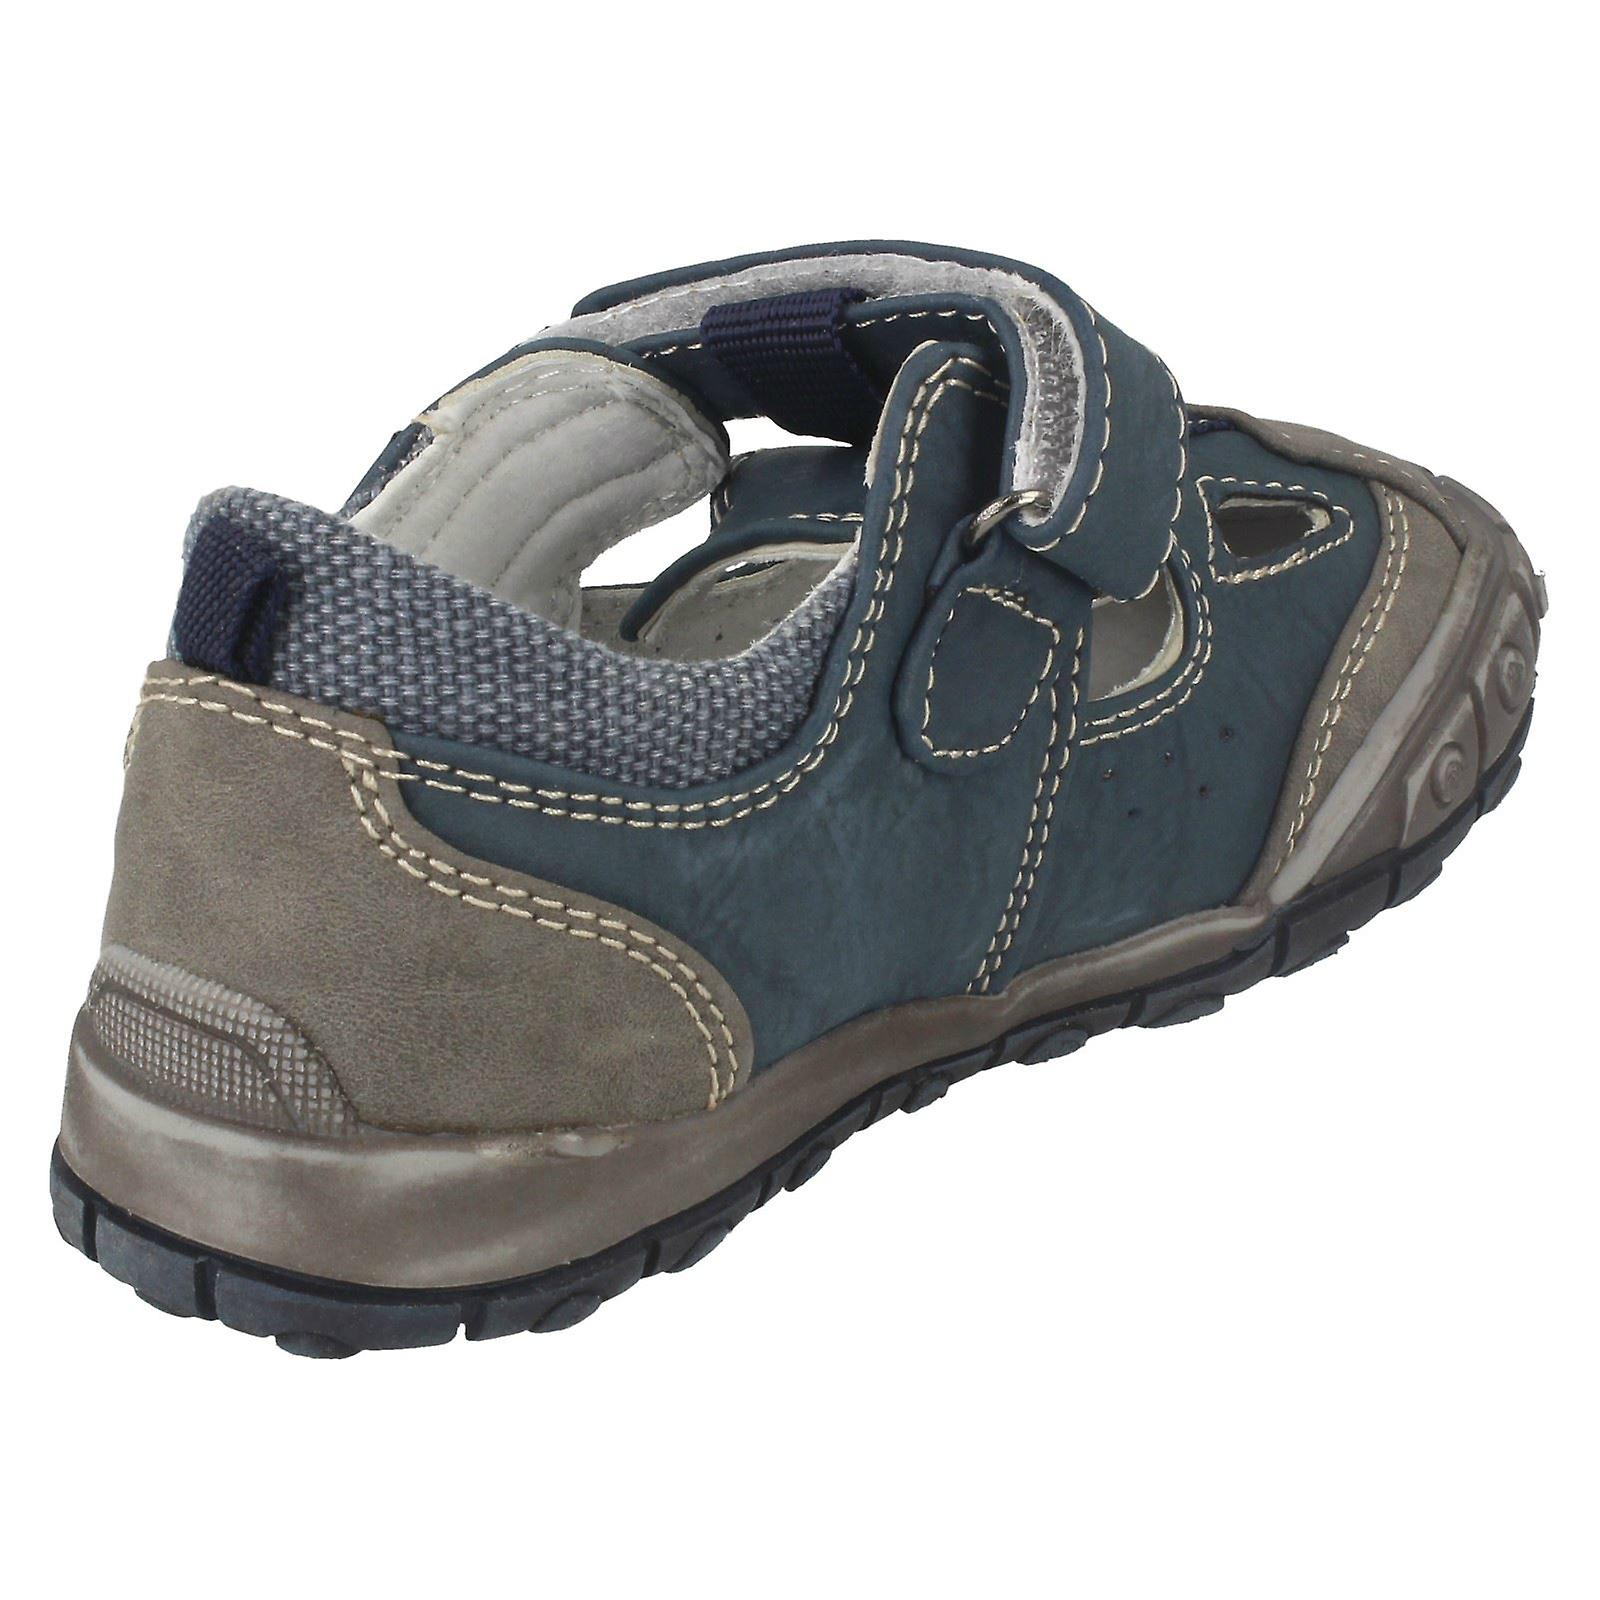 les les les garçons jcdees flat velcro chaussures - n1046 83d52d